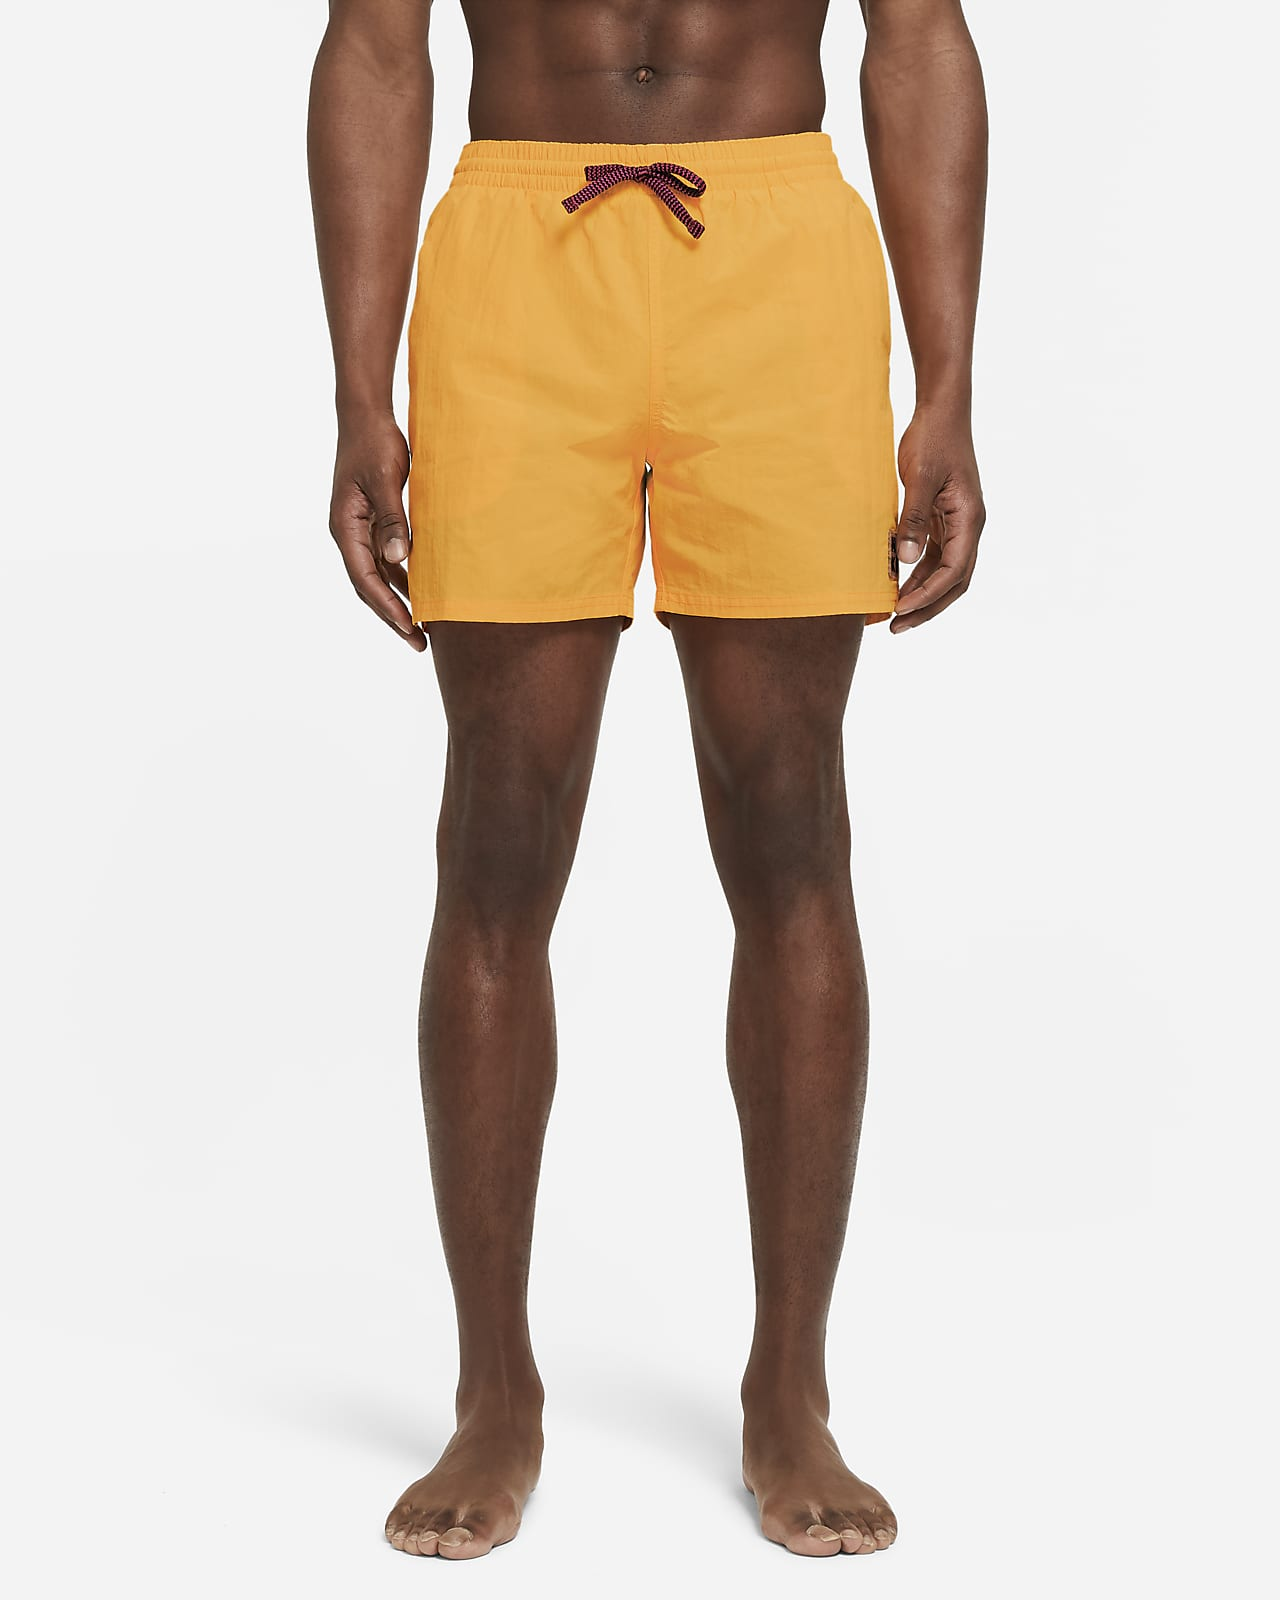 Badshorts Nike Solid Icon 13 cm för män